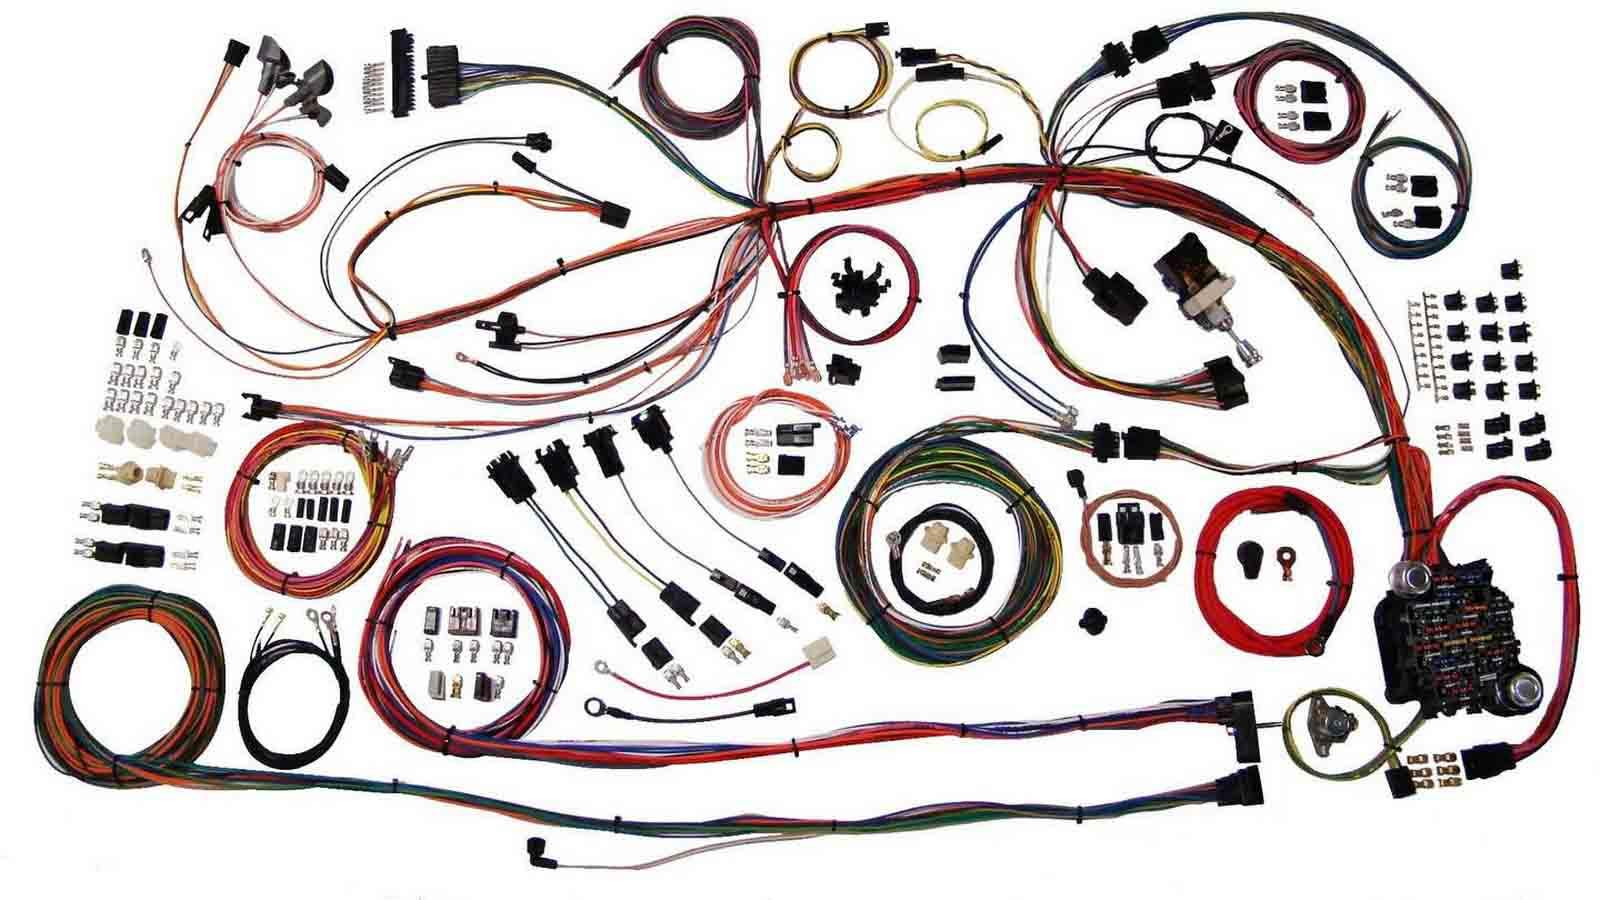 68 chevelle wiring diagram autowire